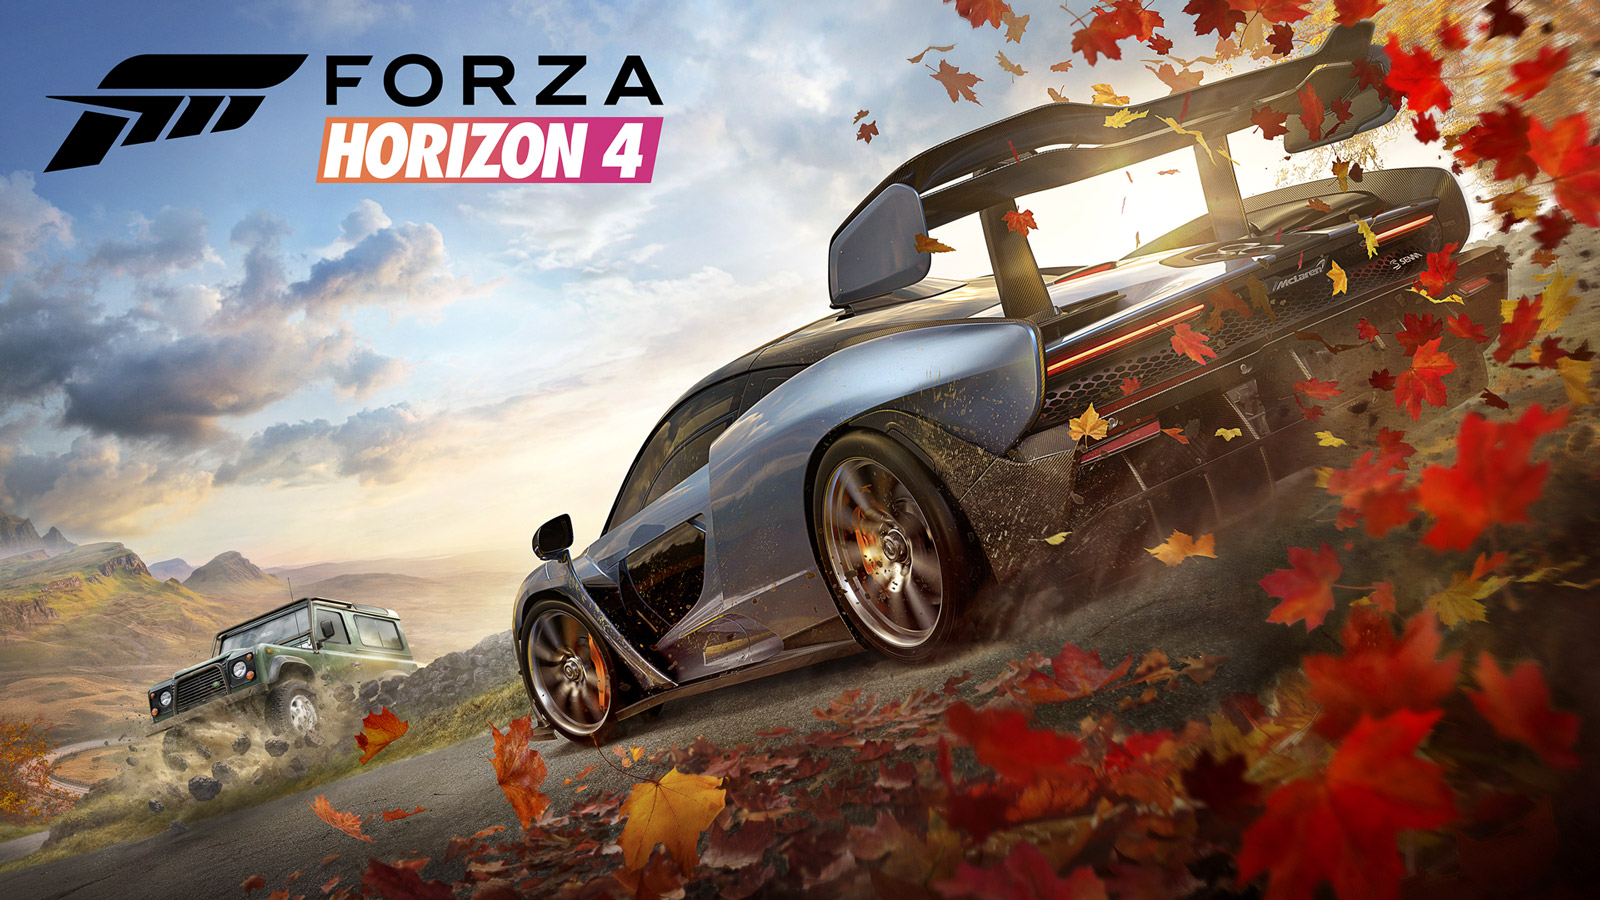 Free Forza Horizon 4 Wallpaper in 1600x900